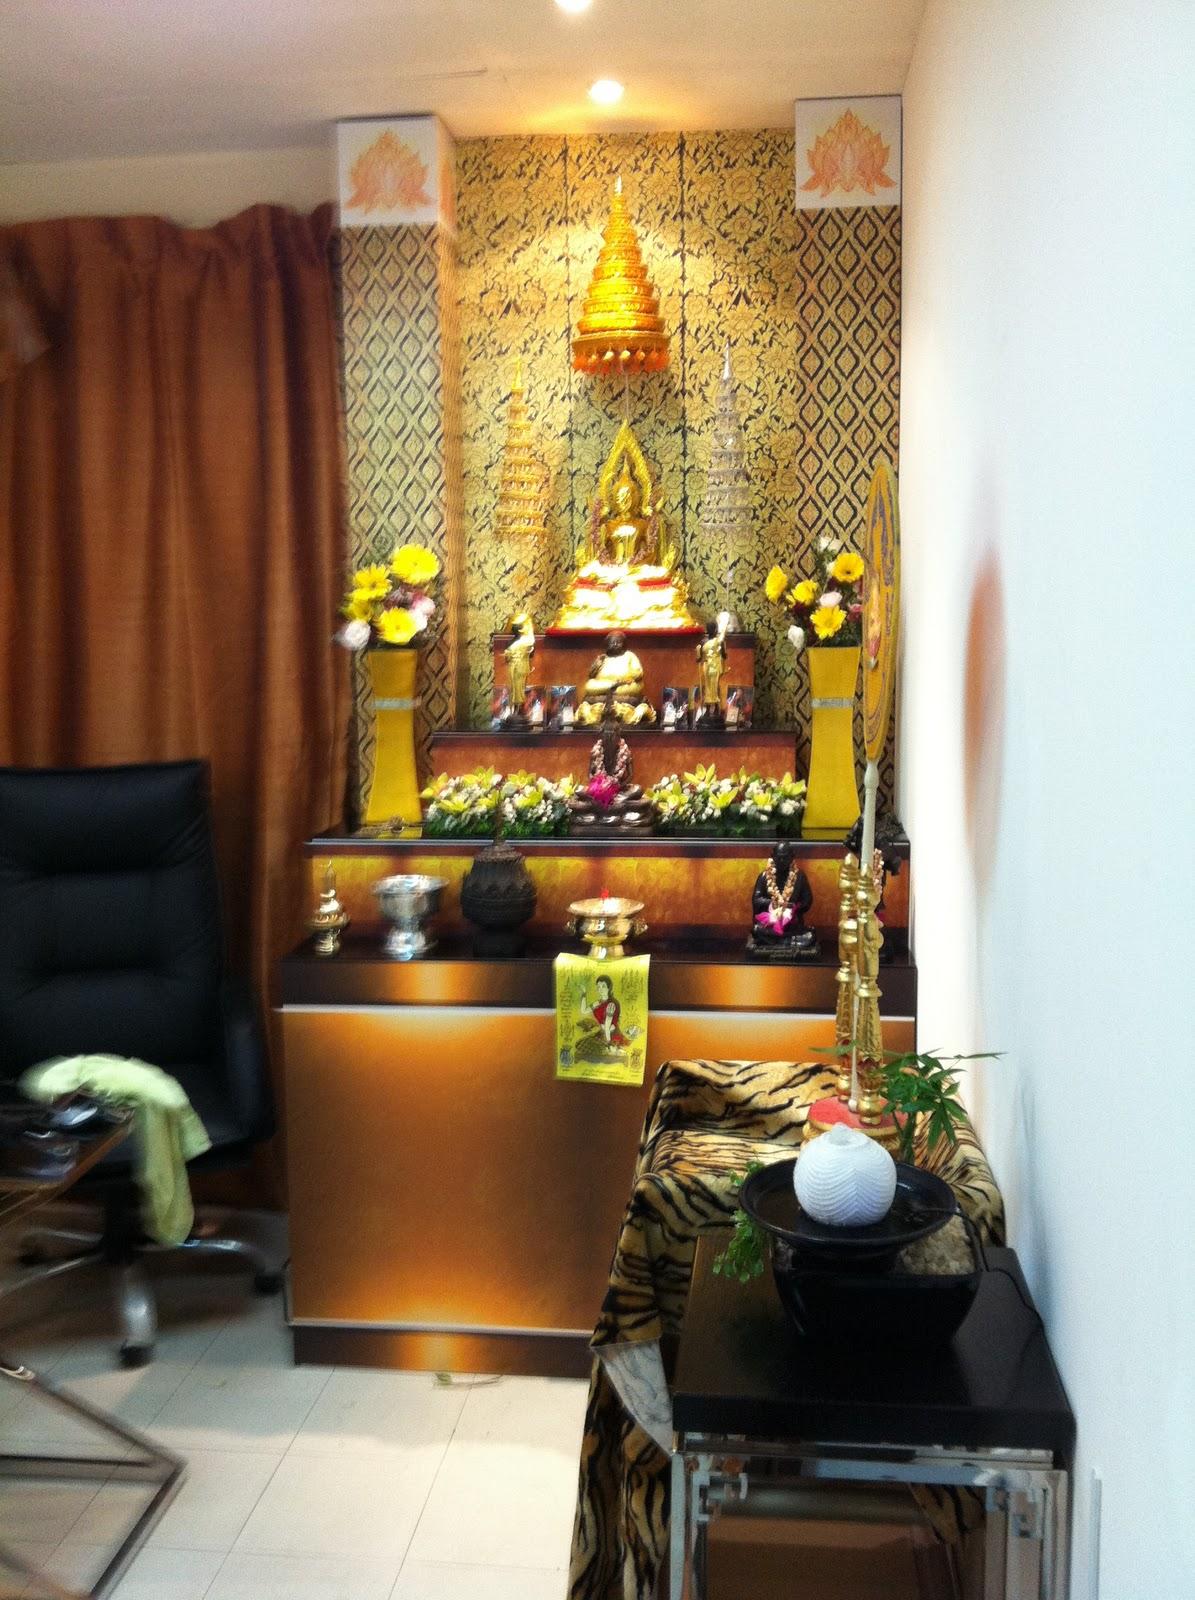 Items From Three Treasures Llp Items From Three Treasures At 04 46 Sultan Plaza Jalan Sultan